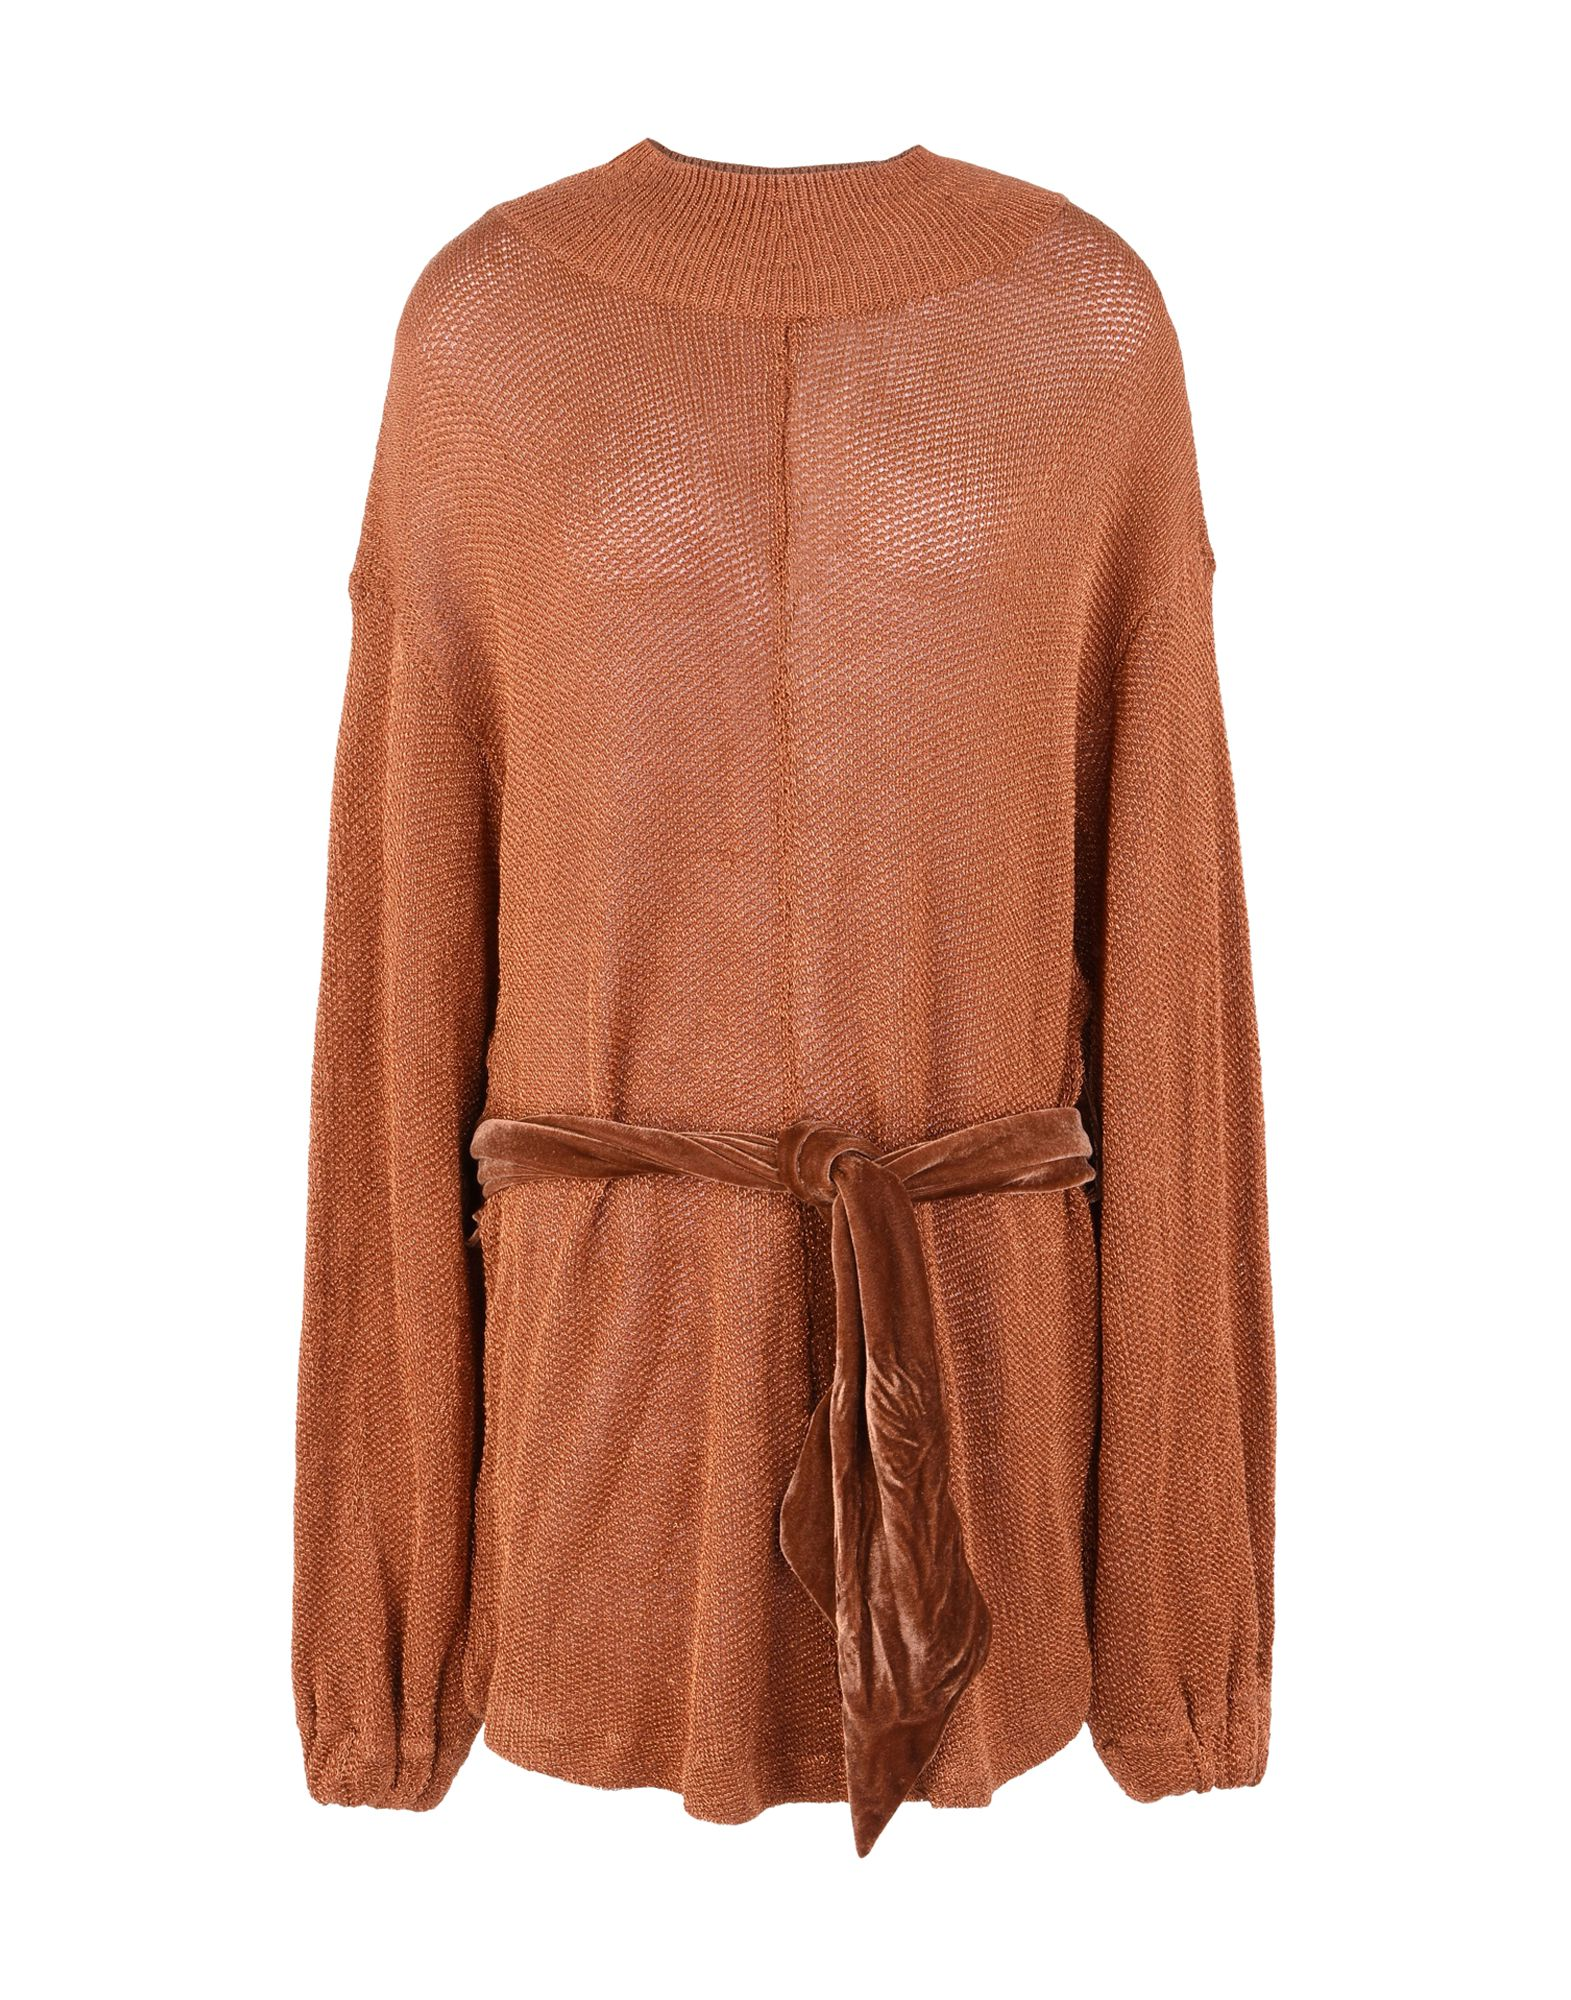 fc7267edc4 Free People Fete Sweater Dress - Polo Neck - Women Free People Polo ...